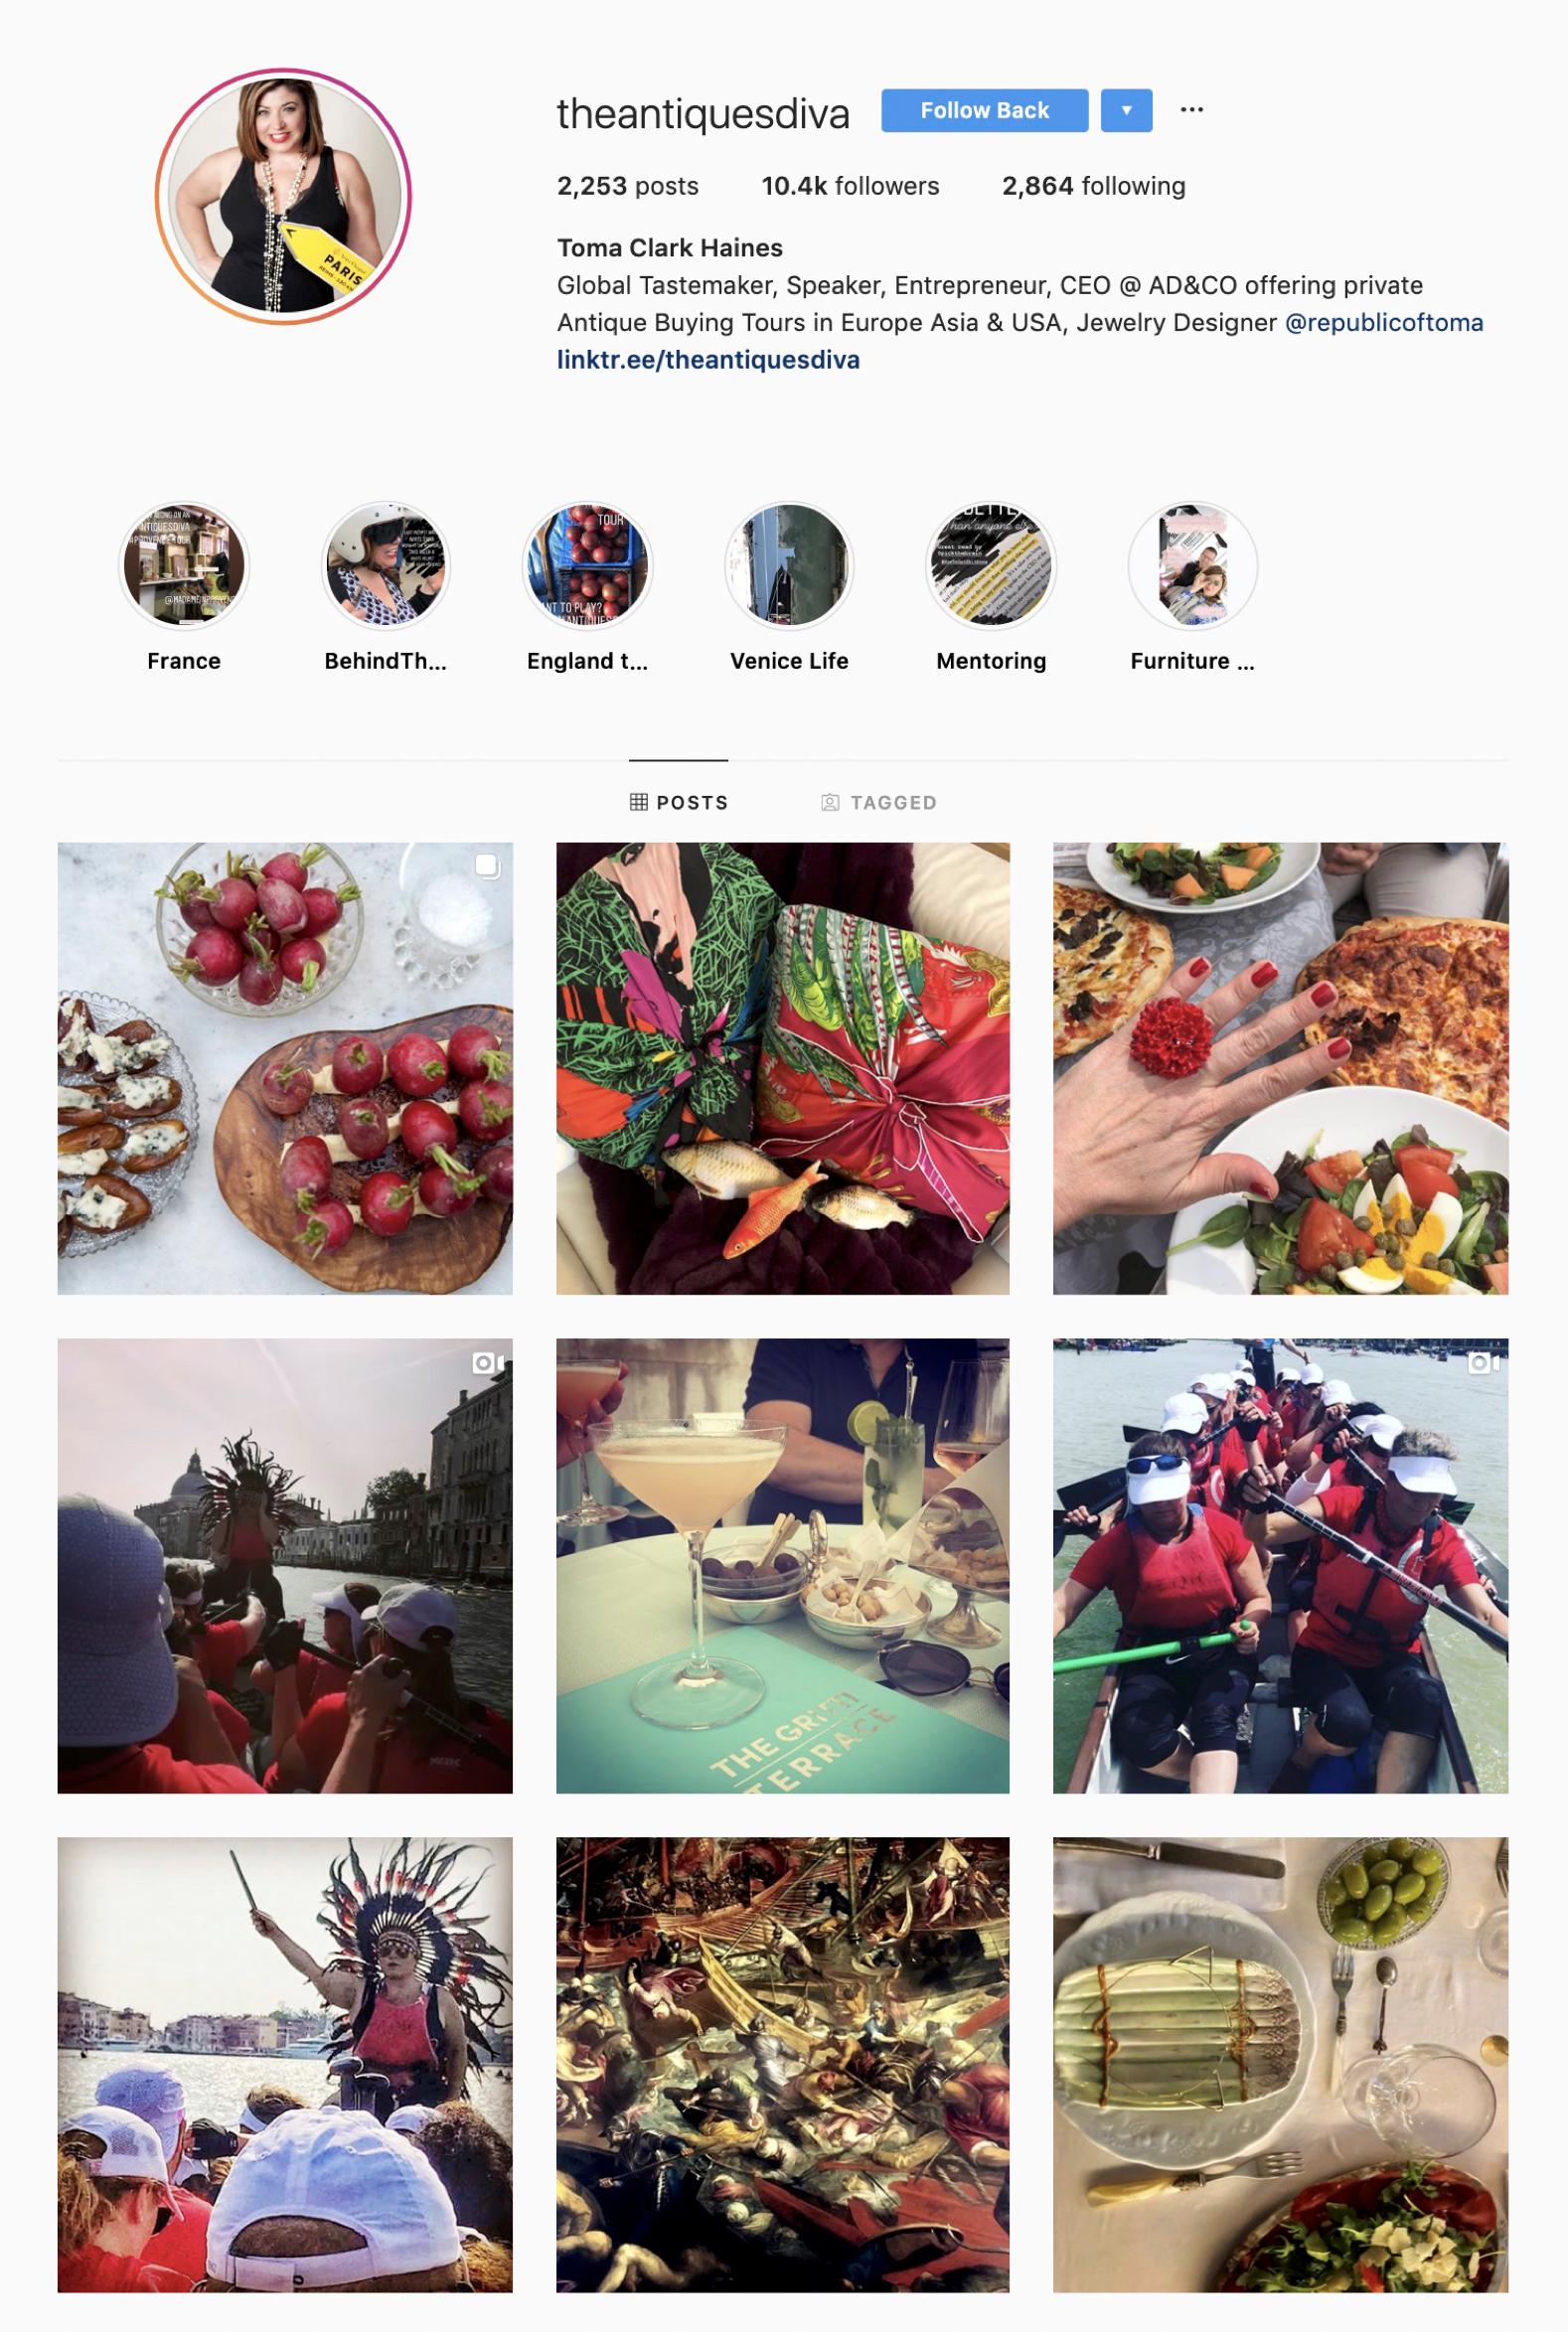 antiques diva instagram - sarah pottharst digital marketing copy.jpg